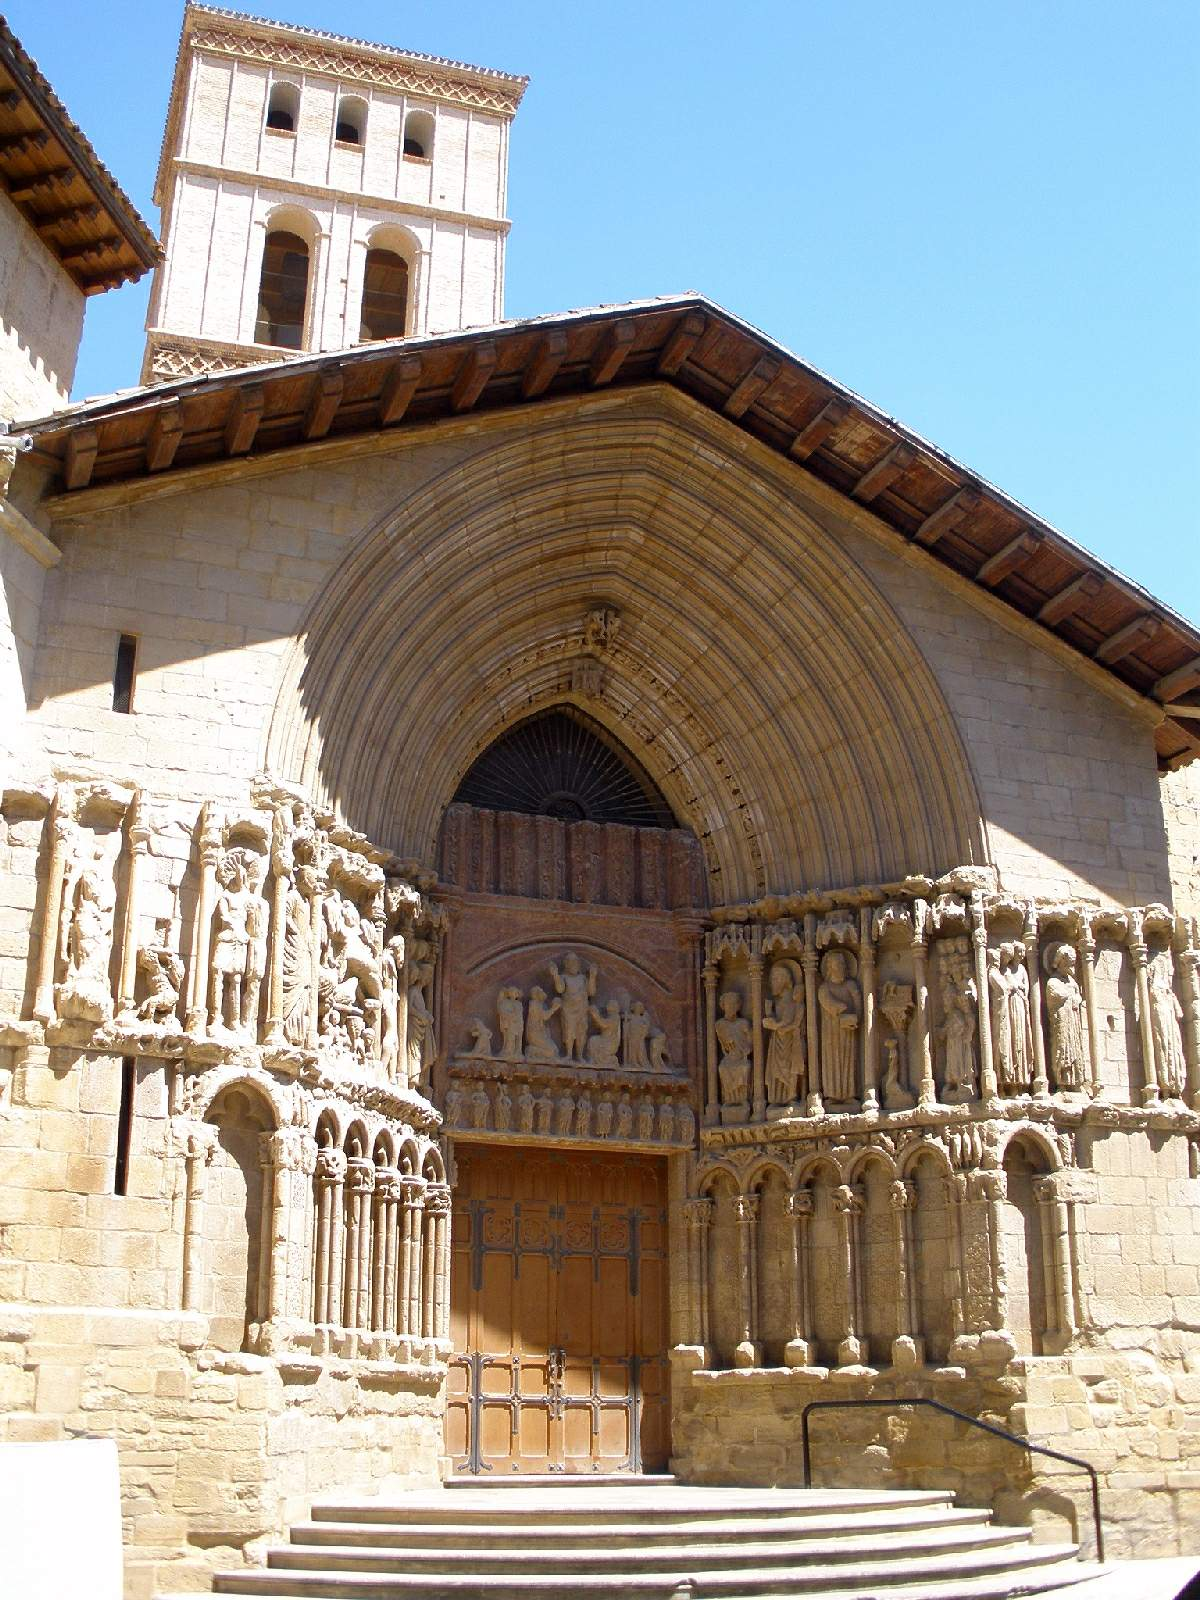 Iglesia de San Bartolomé (Logroño) - Wikipedia, la enciclopedia libre